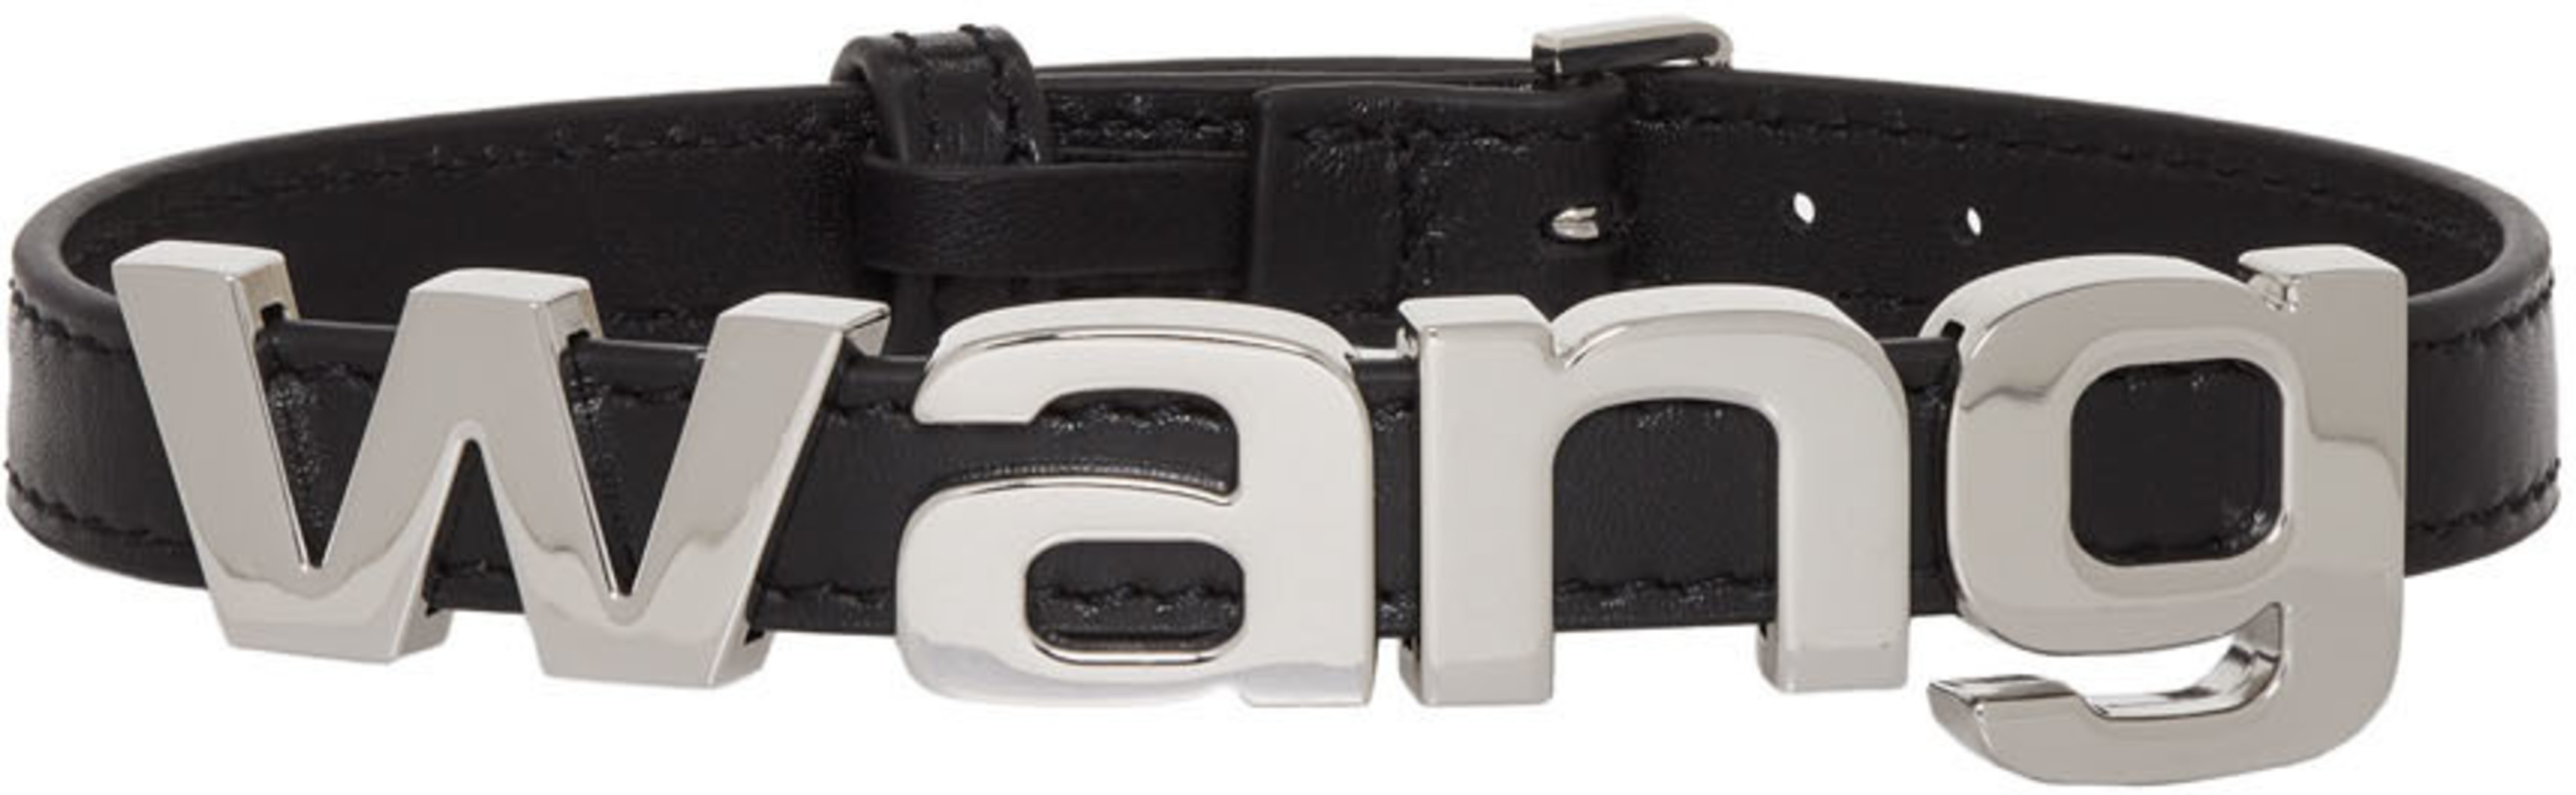 https://img.ssensemedia.com/images/b_white/c_scale,h_820/f_auto,dpr_1.3/192187F023002_1/alexander-wang-collier-ras-du-cou-noir-metal-logo.jpg